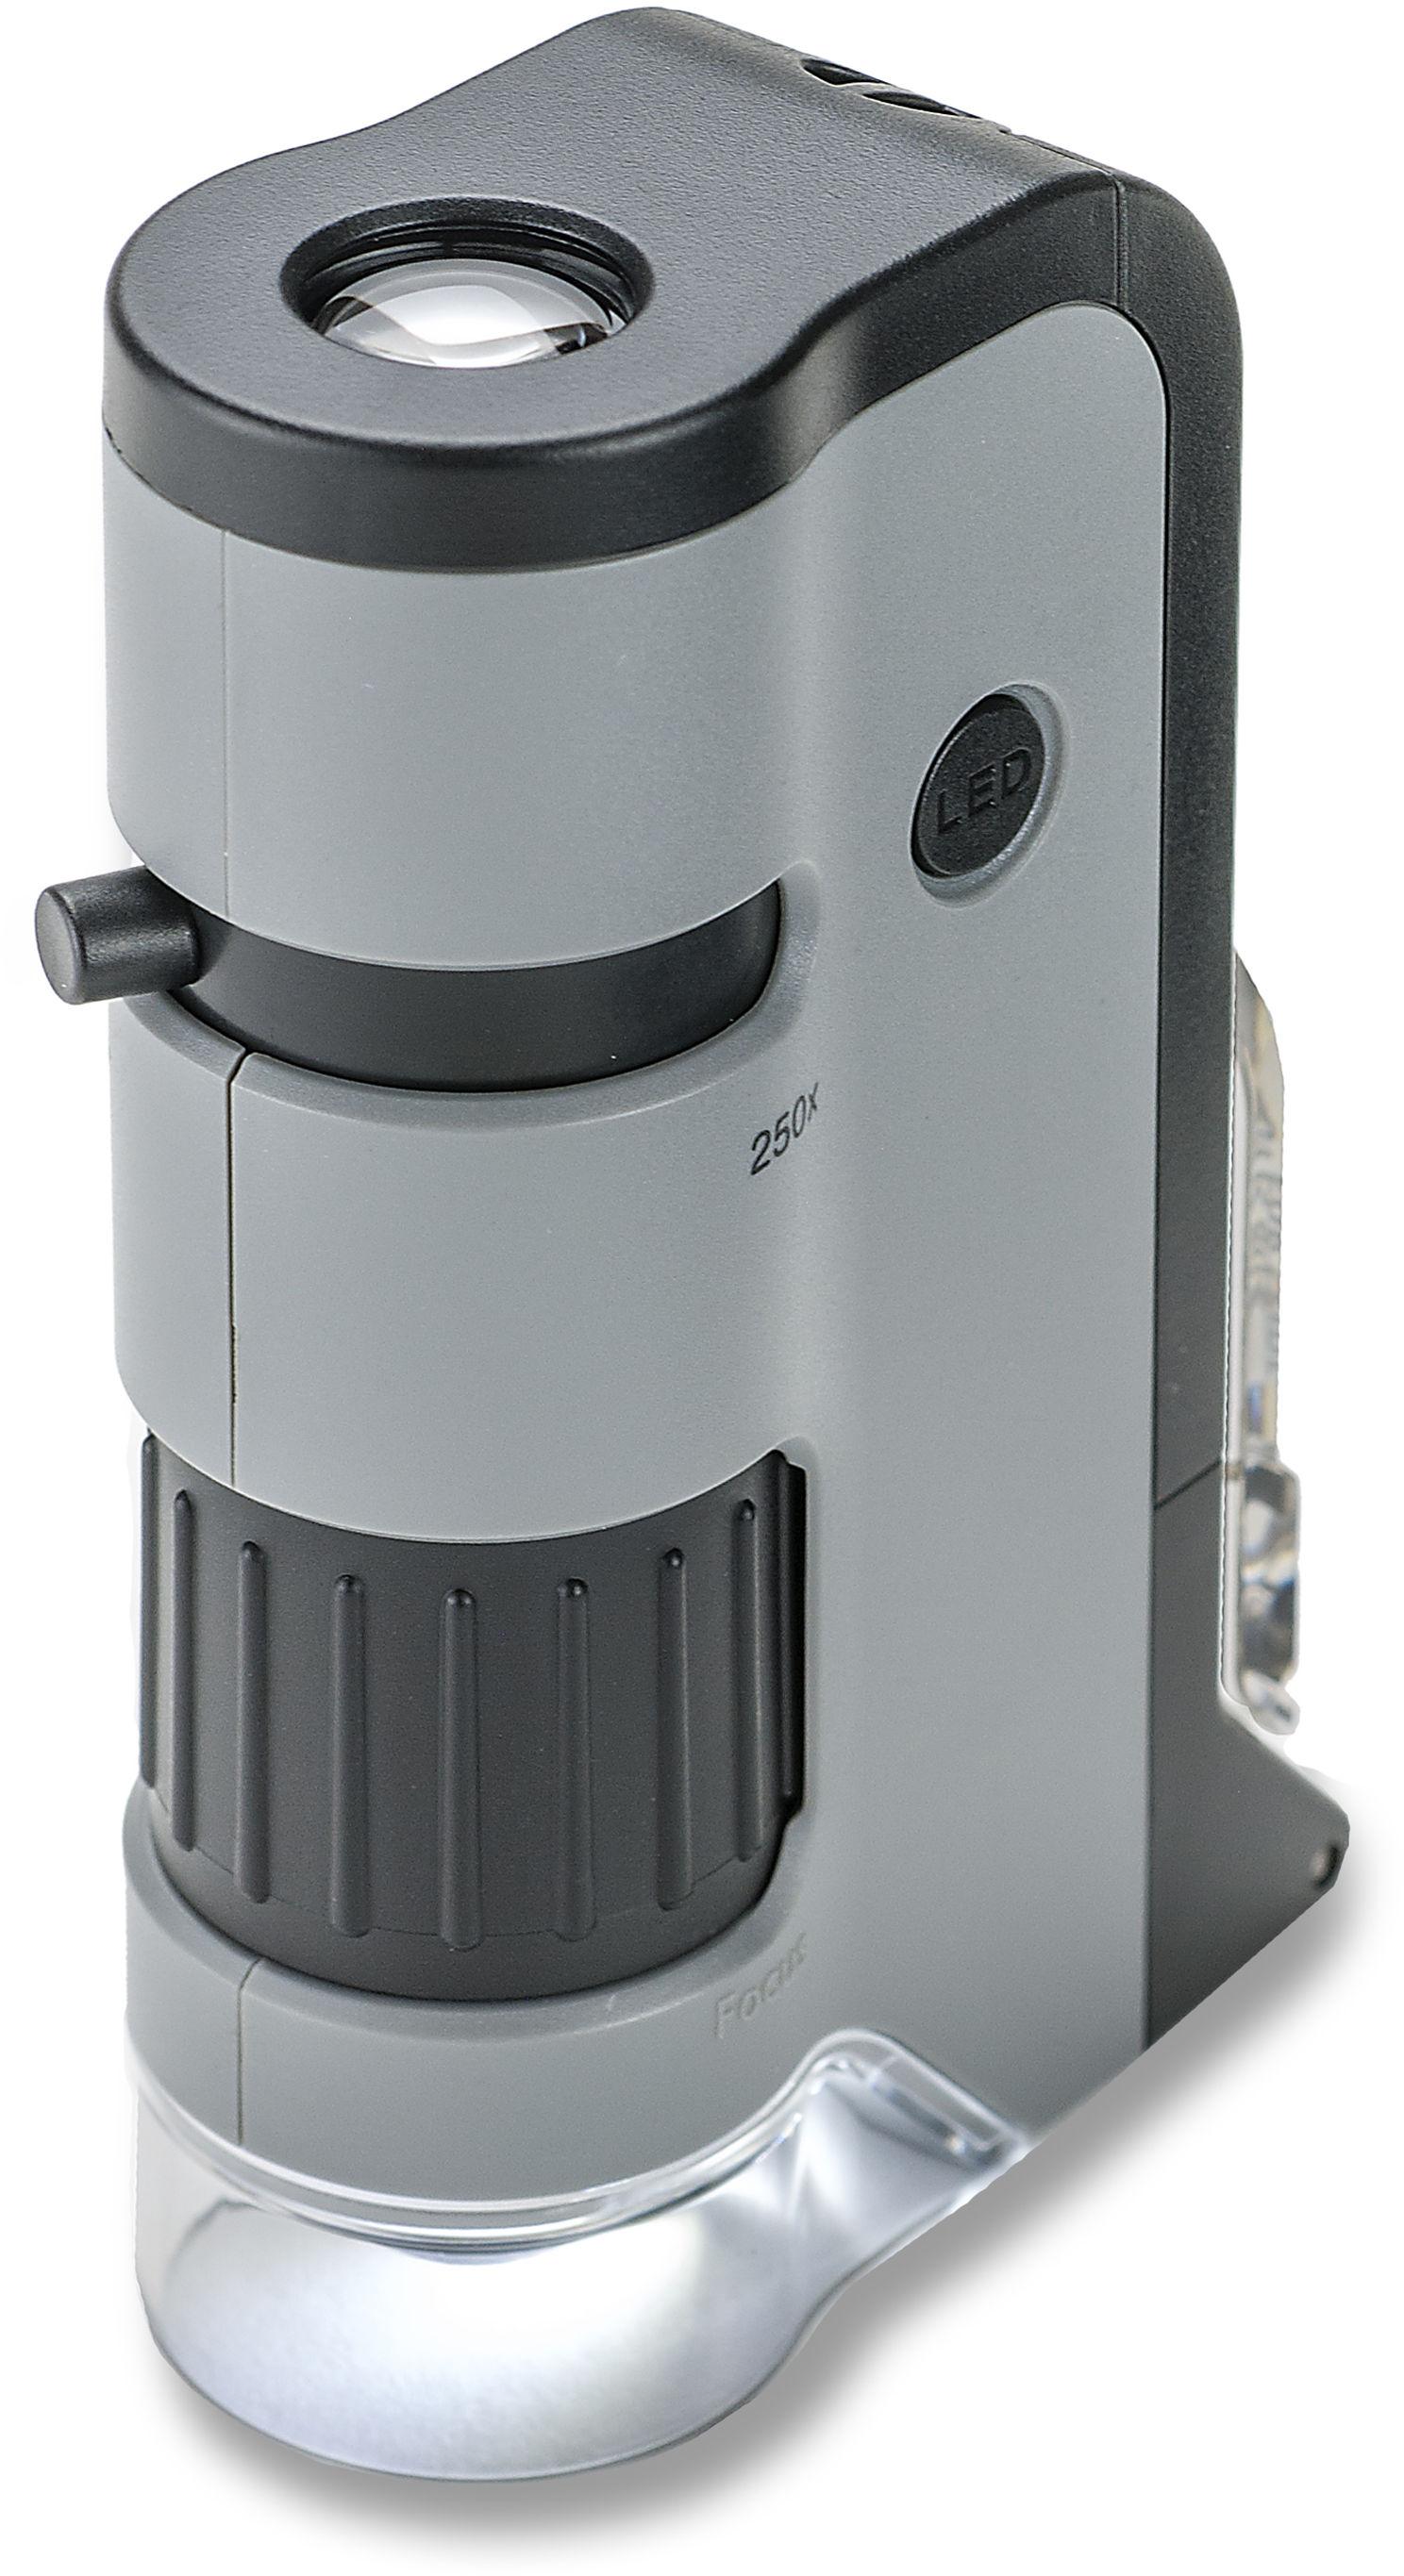 Mikroskop Carson Microflip LED 100-250x (MP-250)